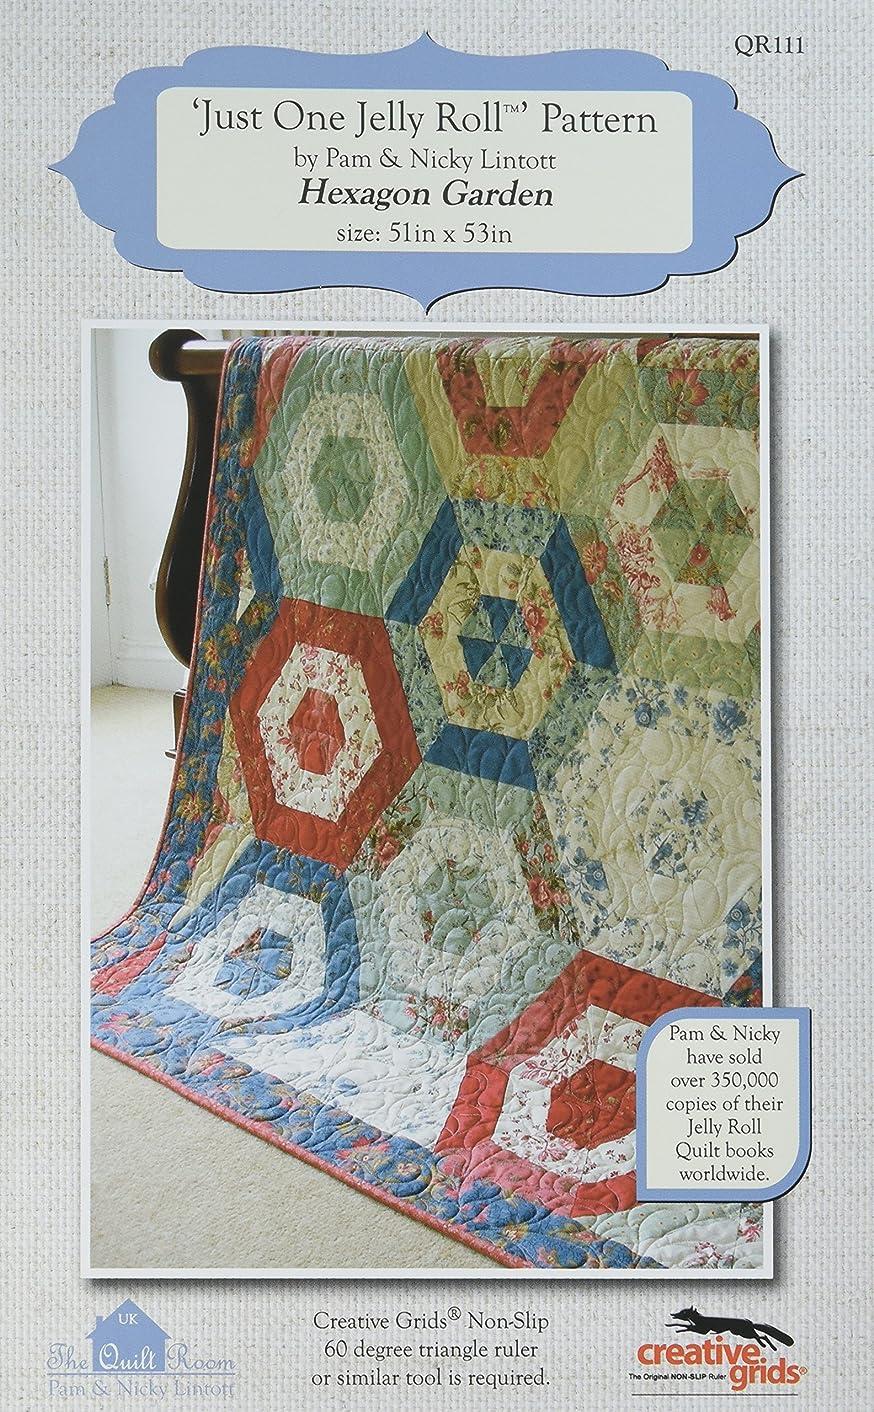 The Quilt Room The Hexagon Garden Pattern